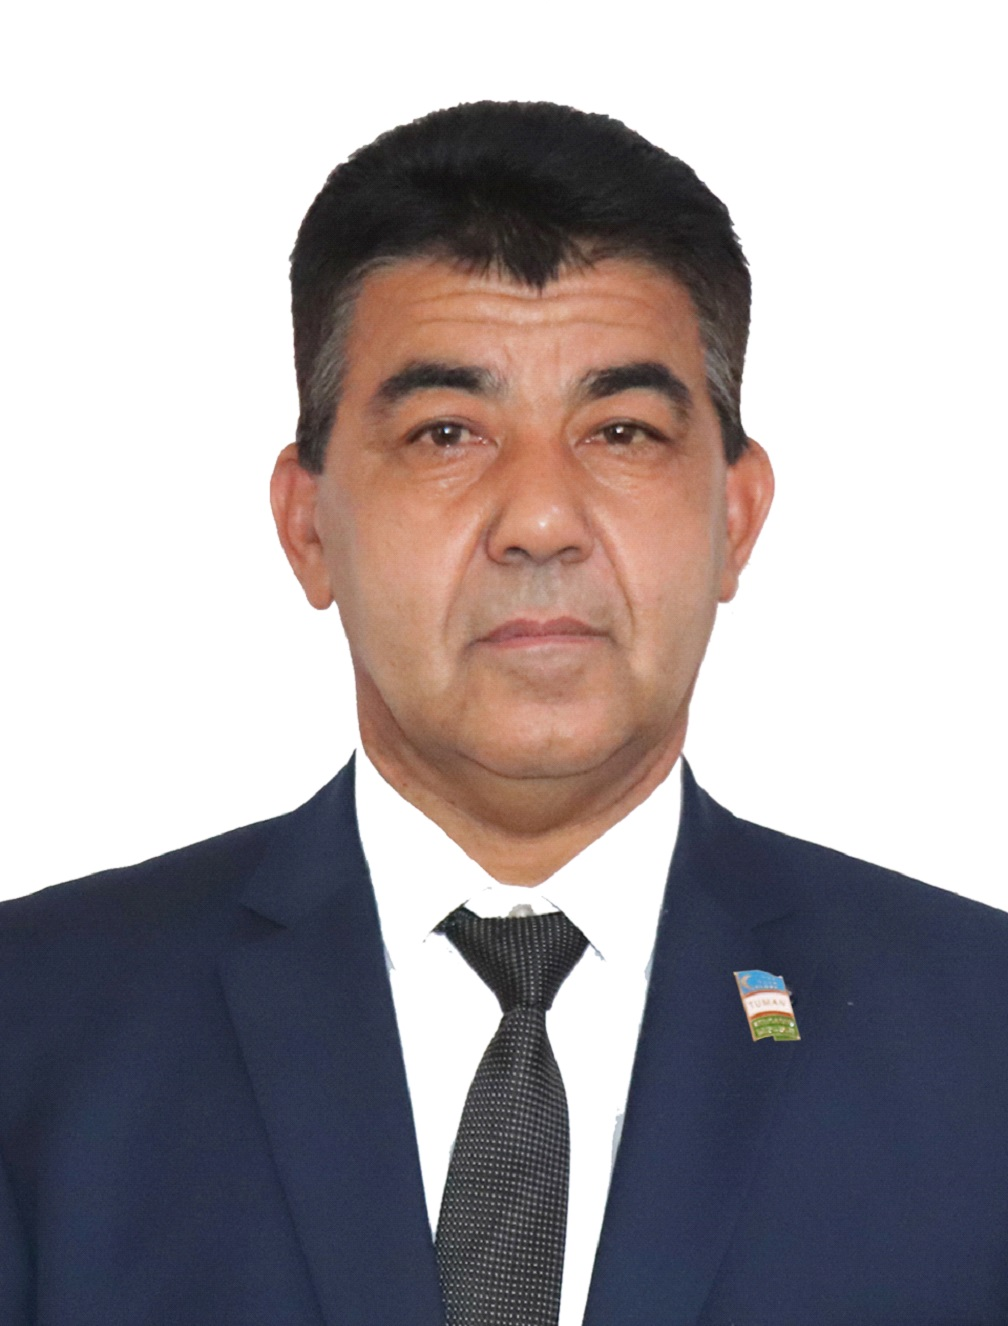 Рахимов Икром Бобомуратович